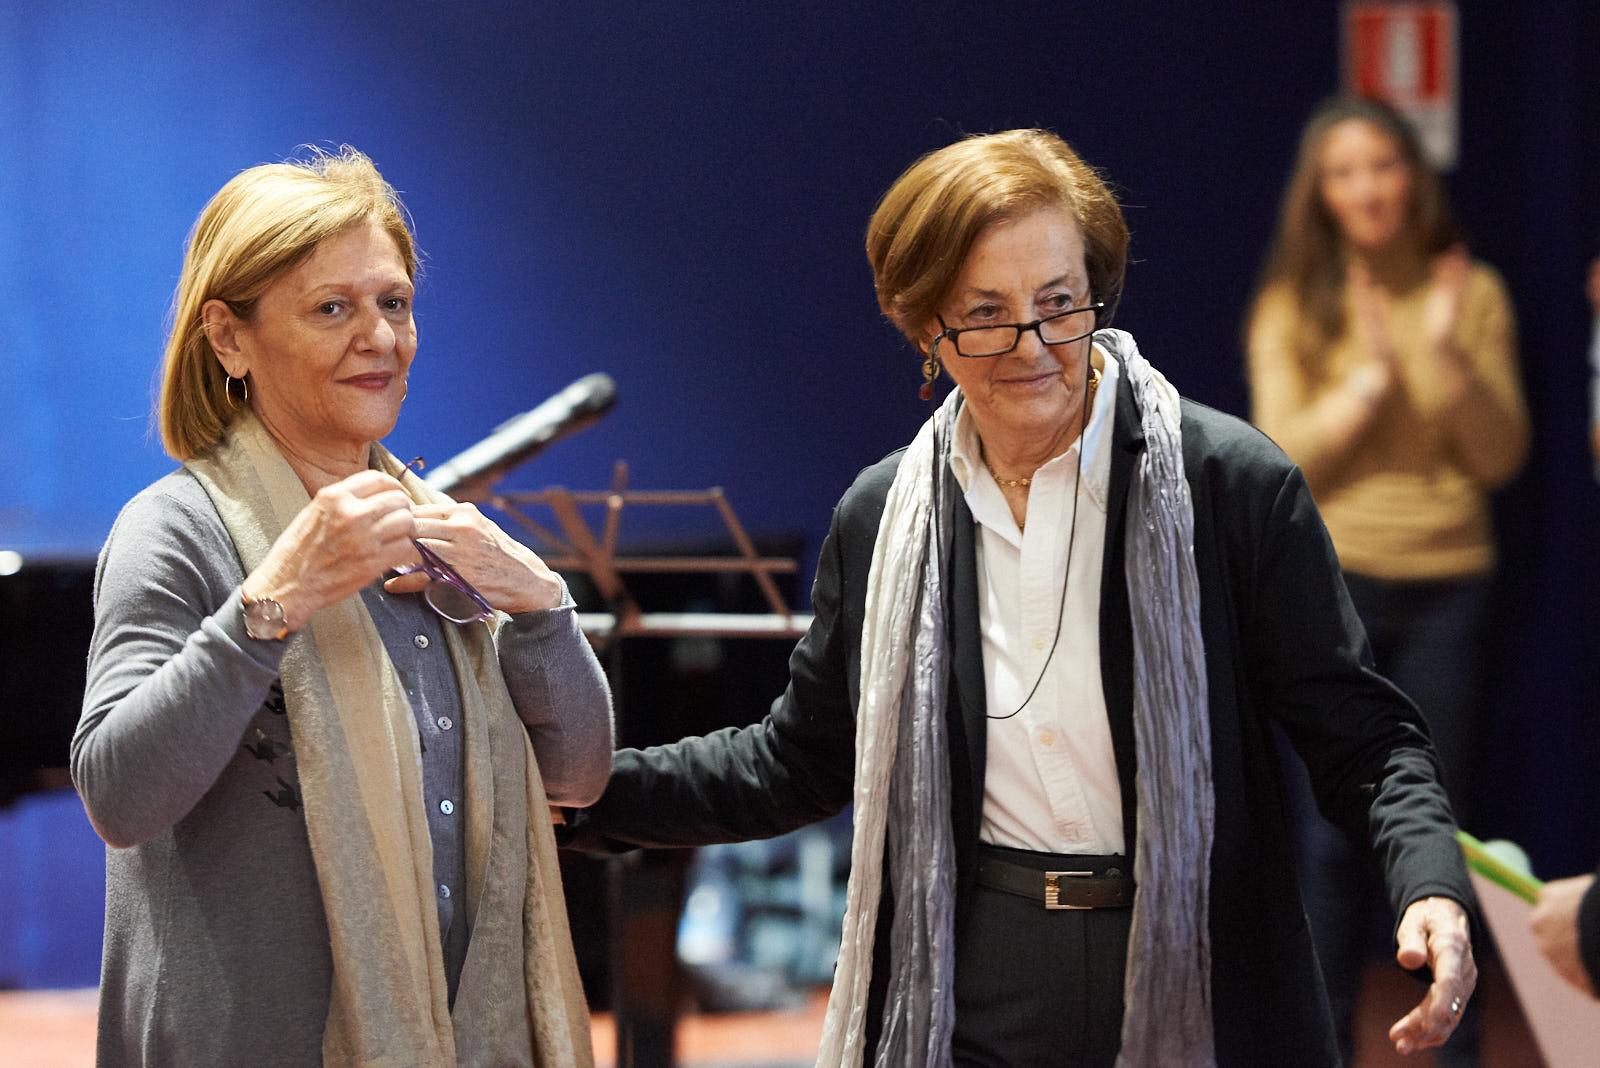 Franca Schiavon e Annamaria Samuelli